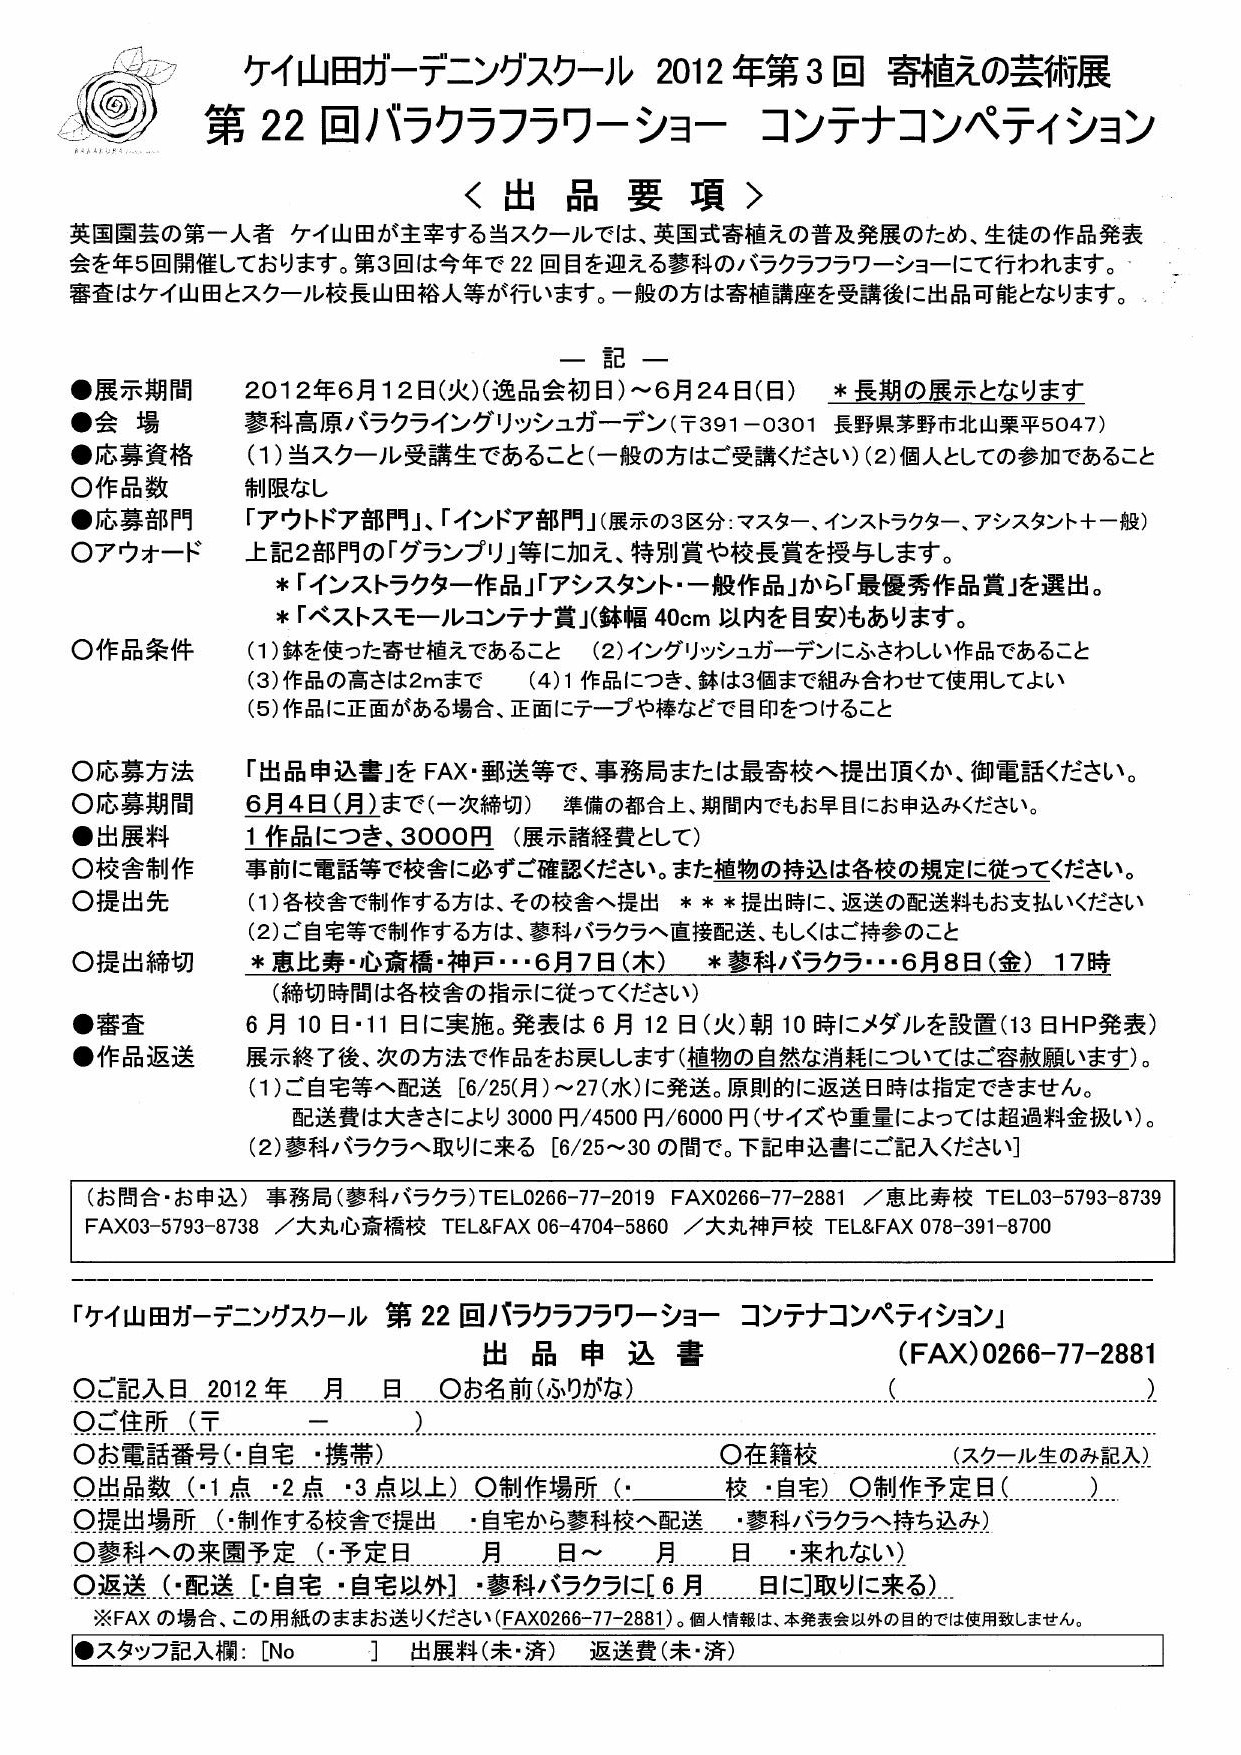 compe entry sheet0001.jpg